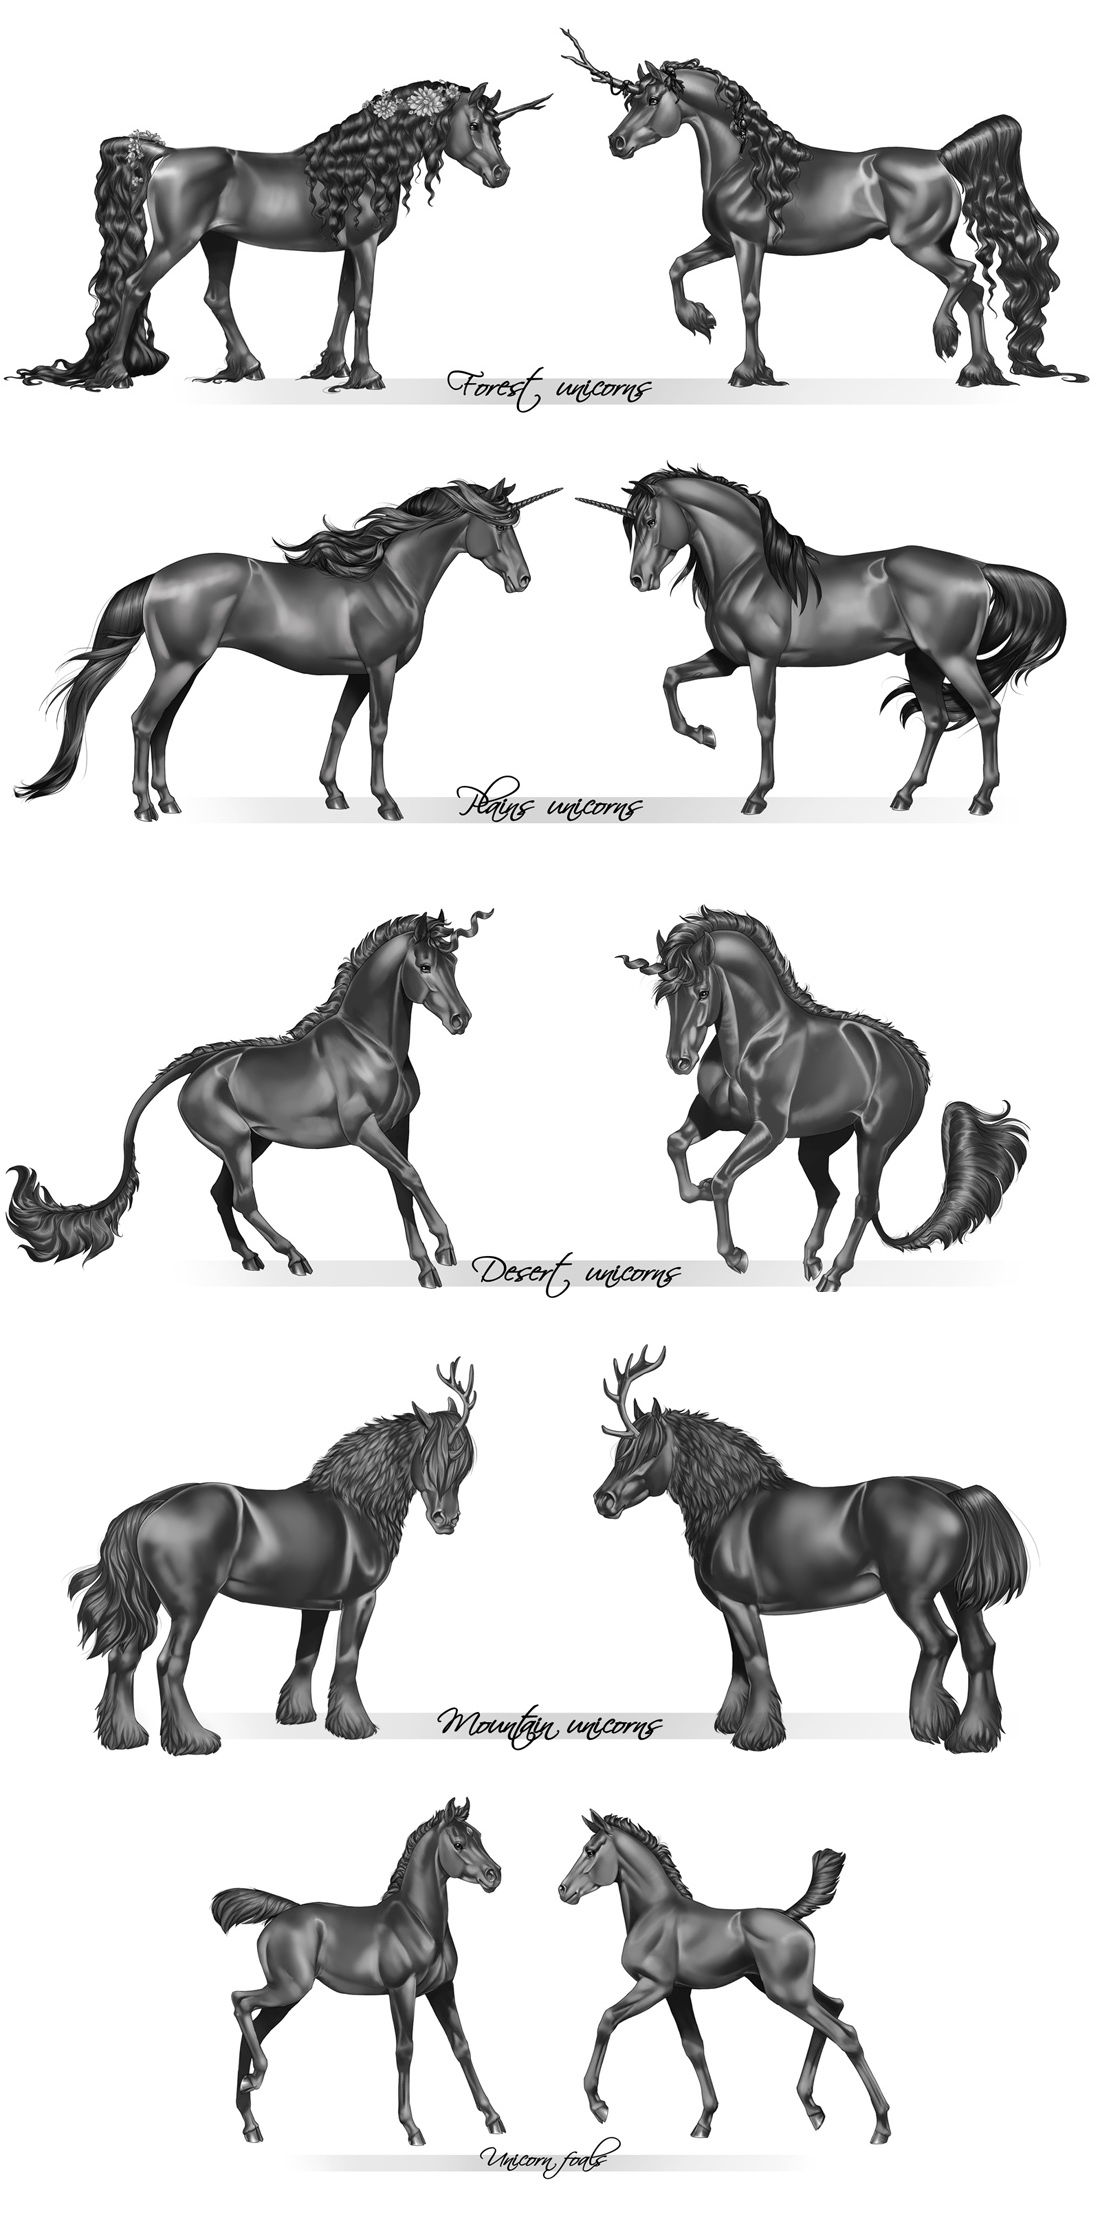 Unicorn species - grayscale by Aomori